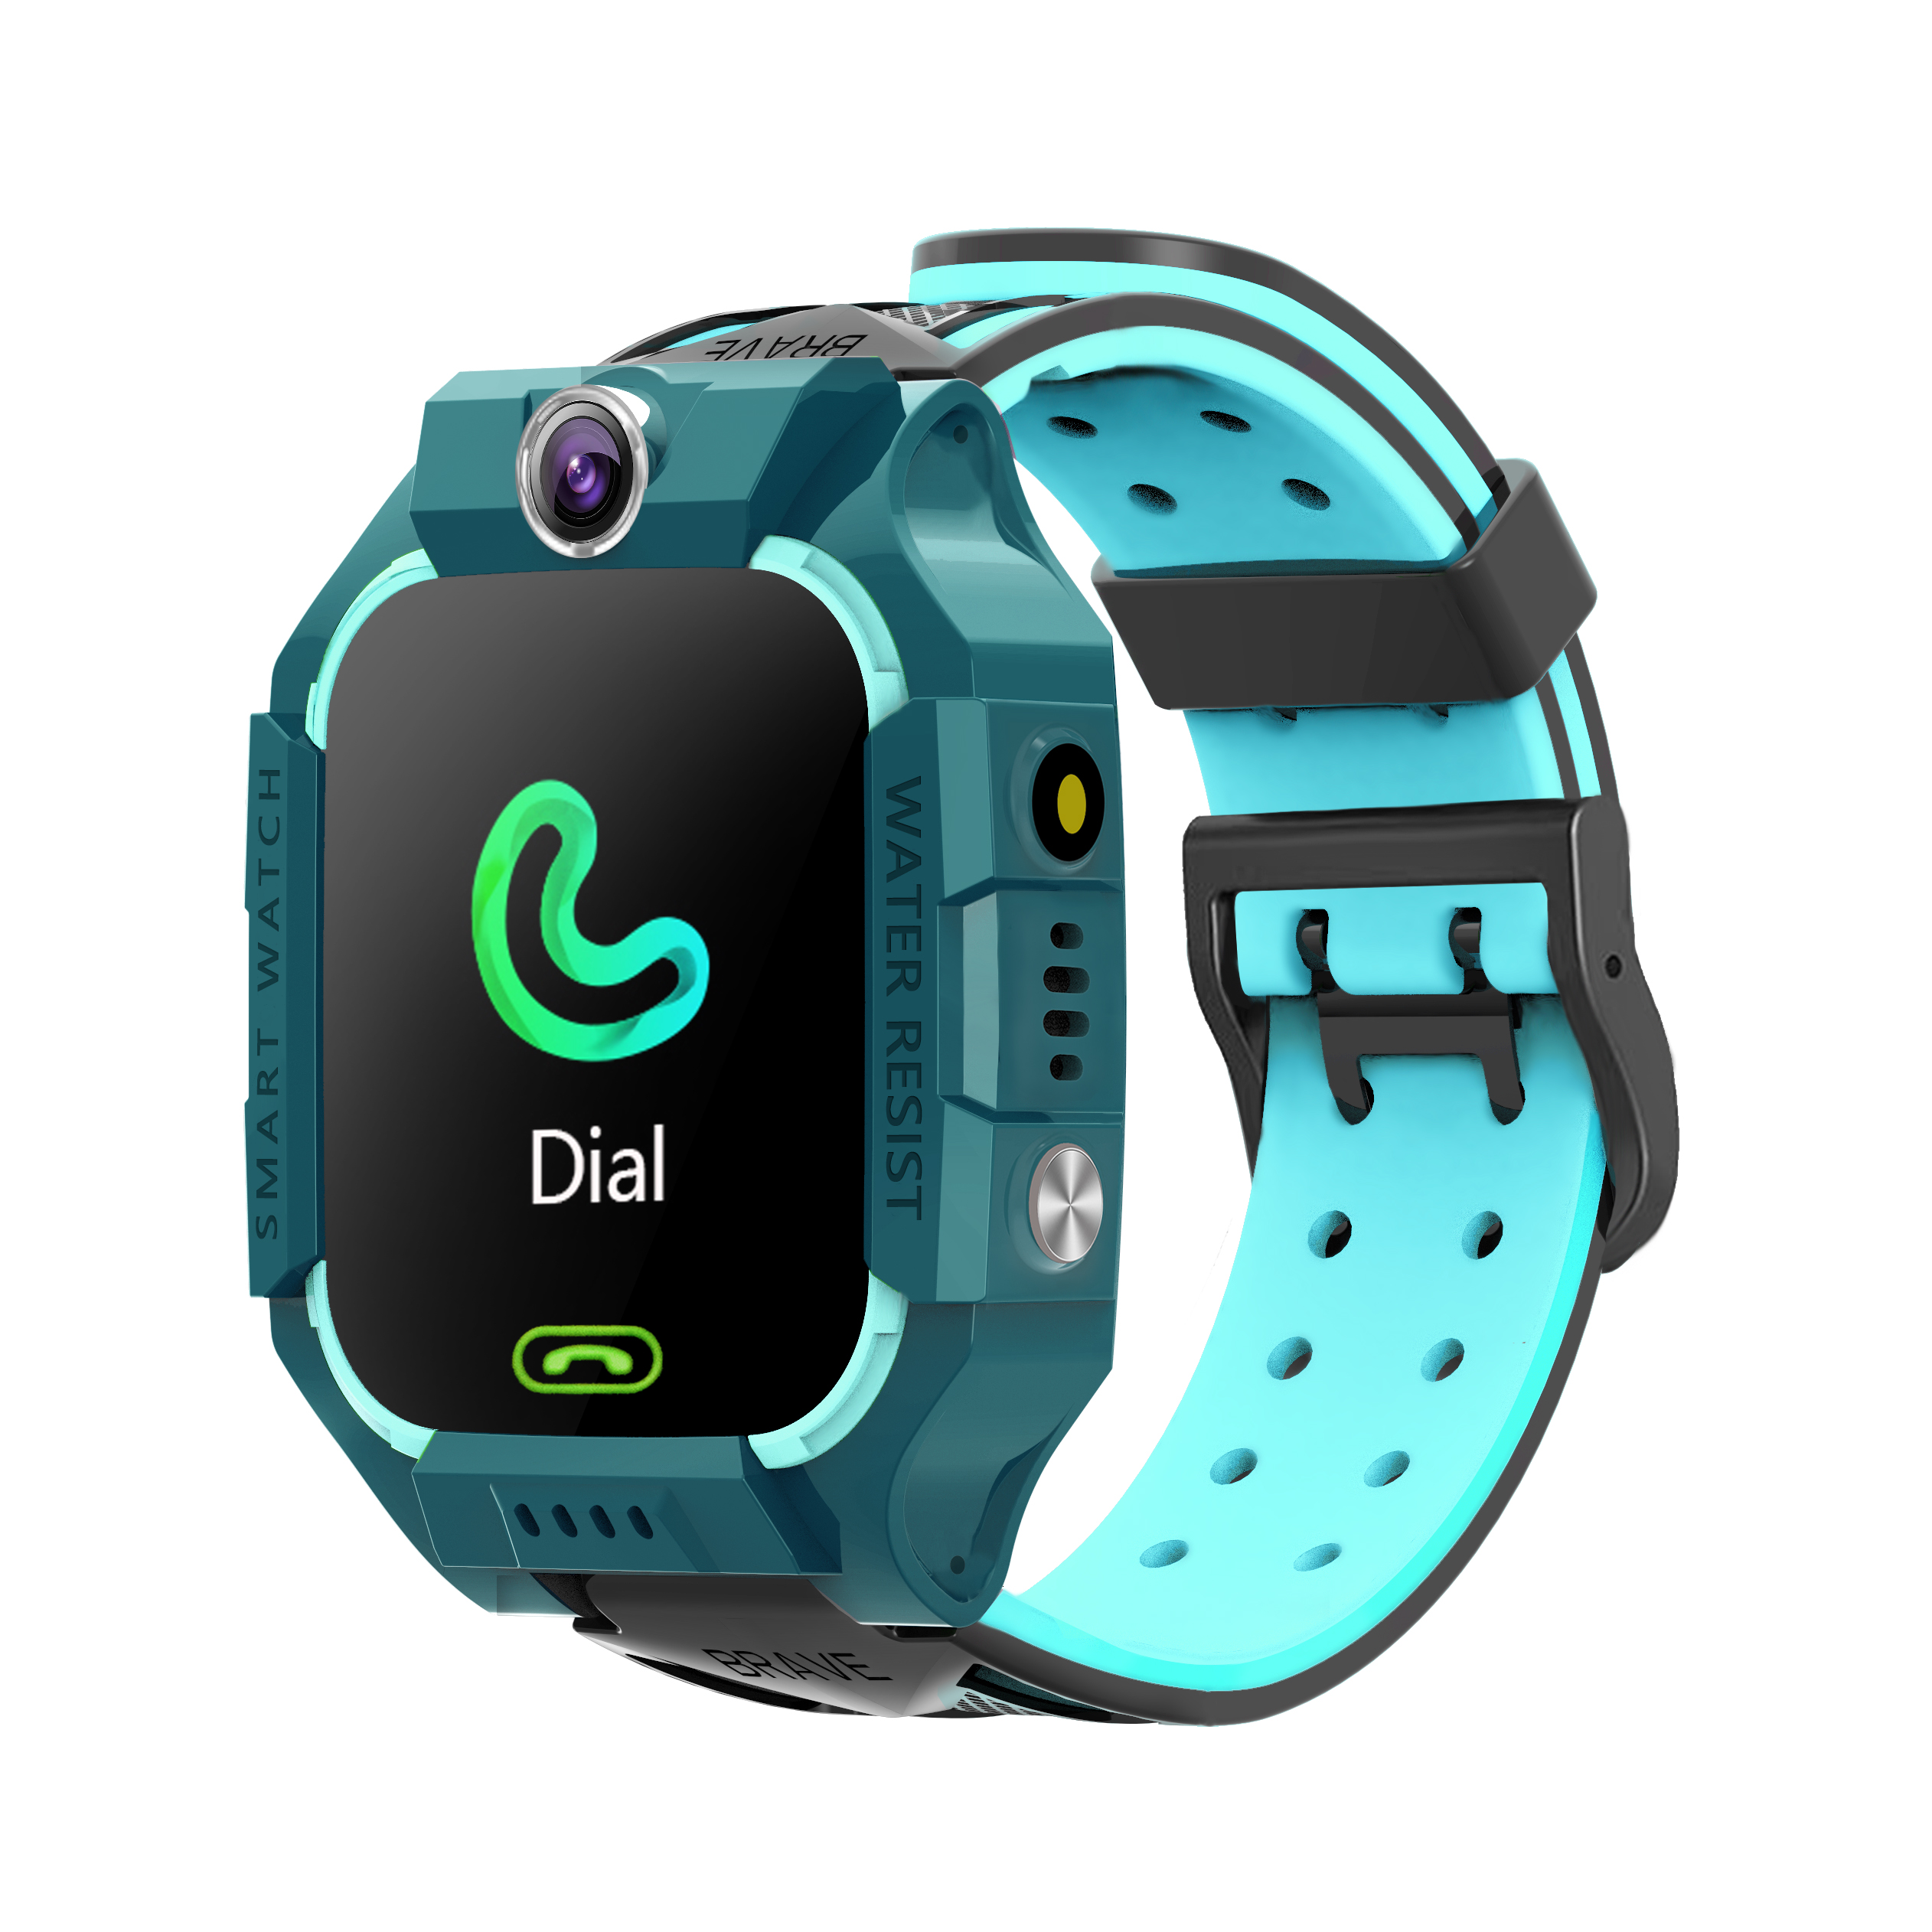 Z6 Children's Phone Watch GPS Flip rotation Location Kids Smartwatch Multifunctions Watch green